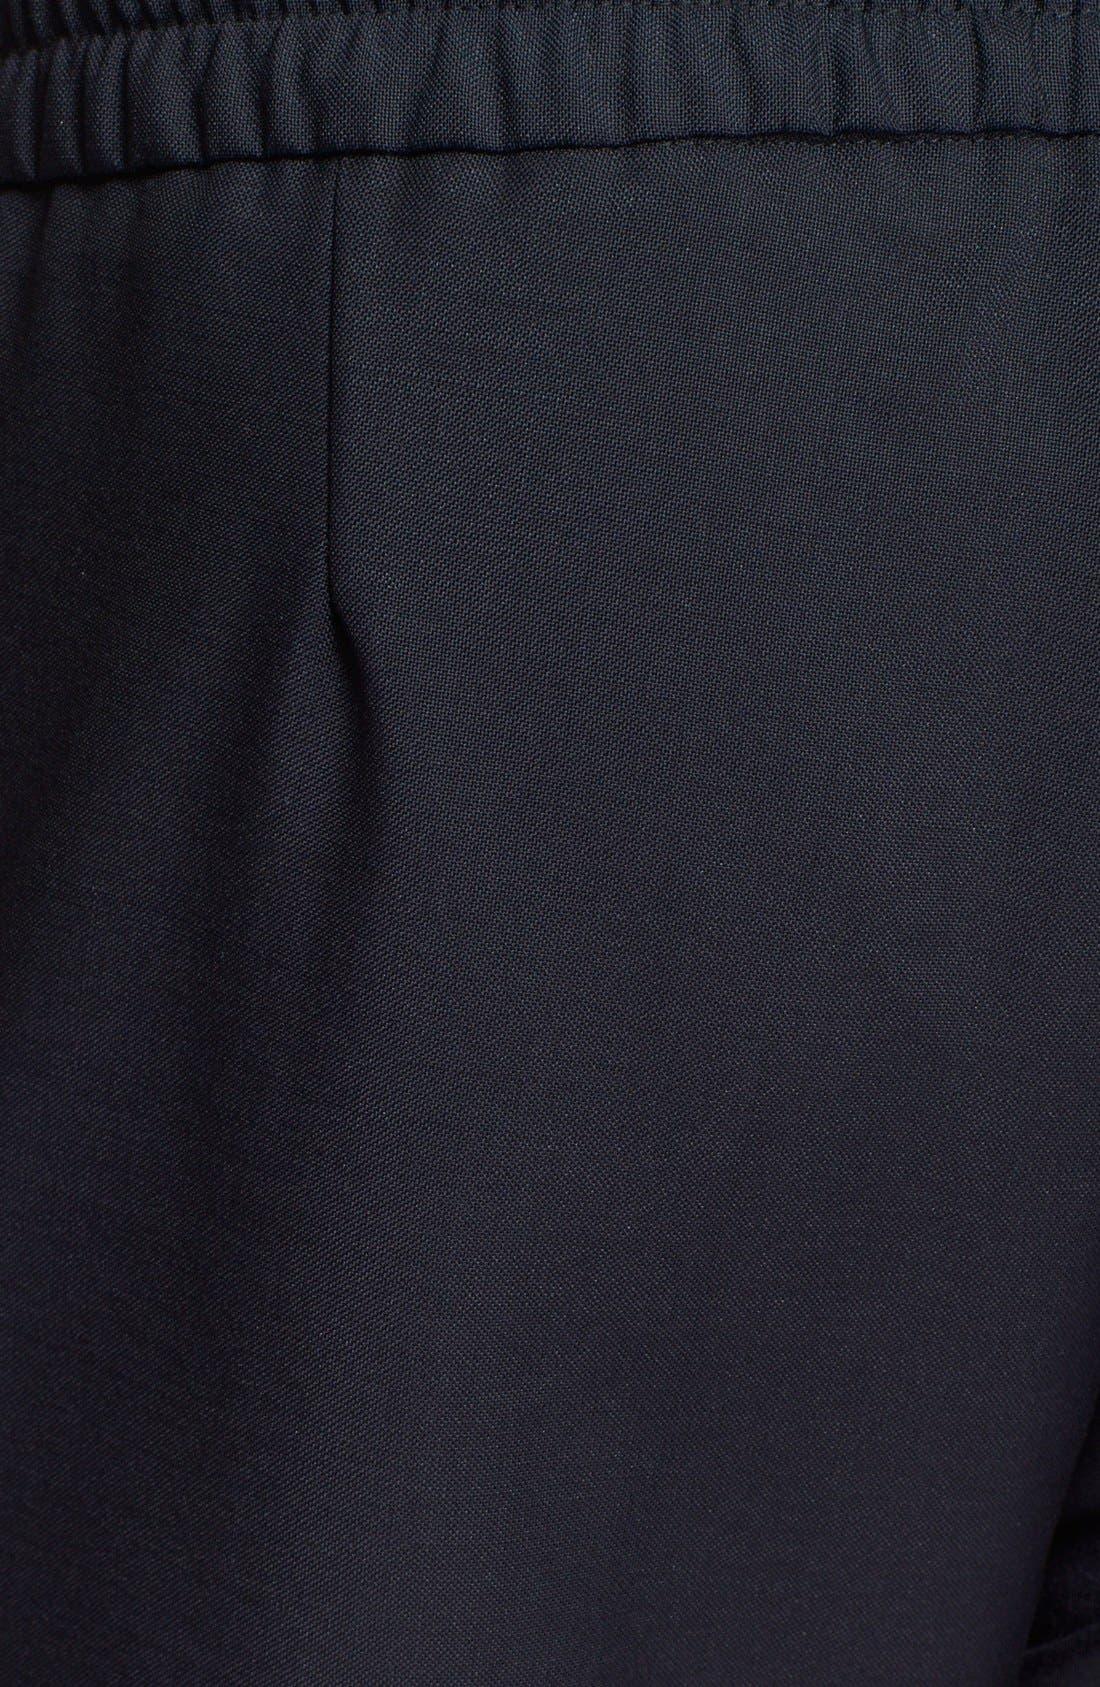 Ryder Wool Pants,                             Alternate thumbnail 5, color,                             Navy